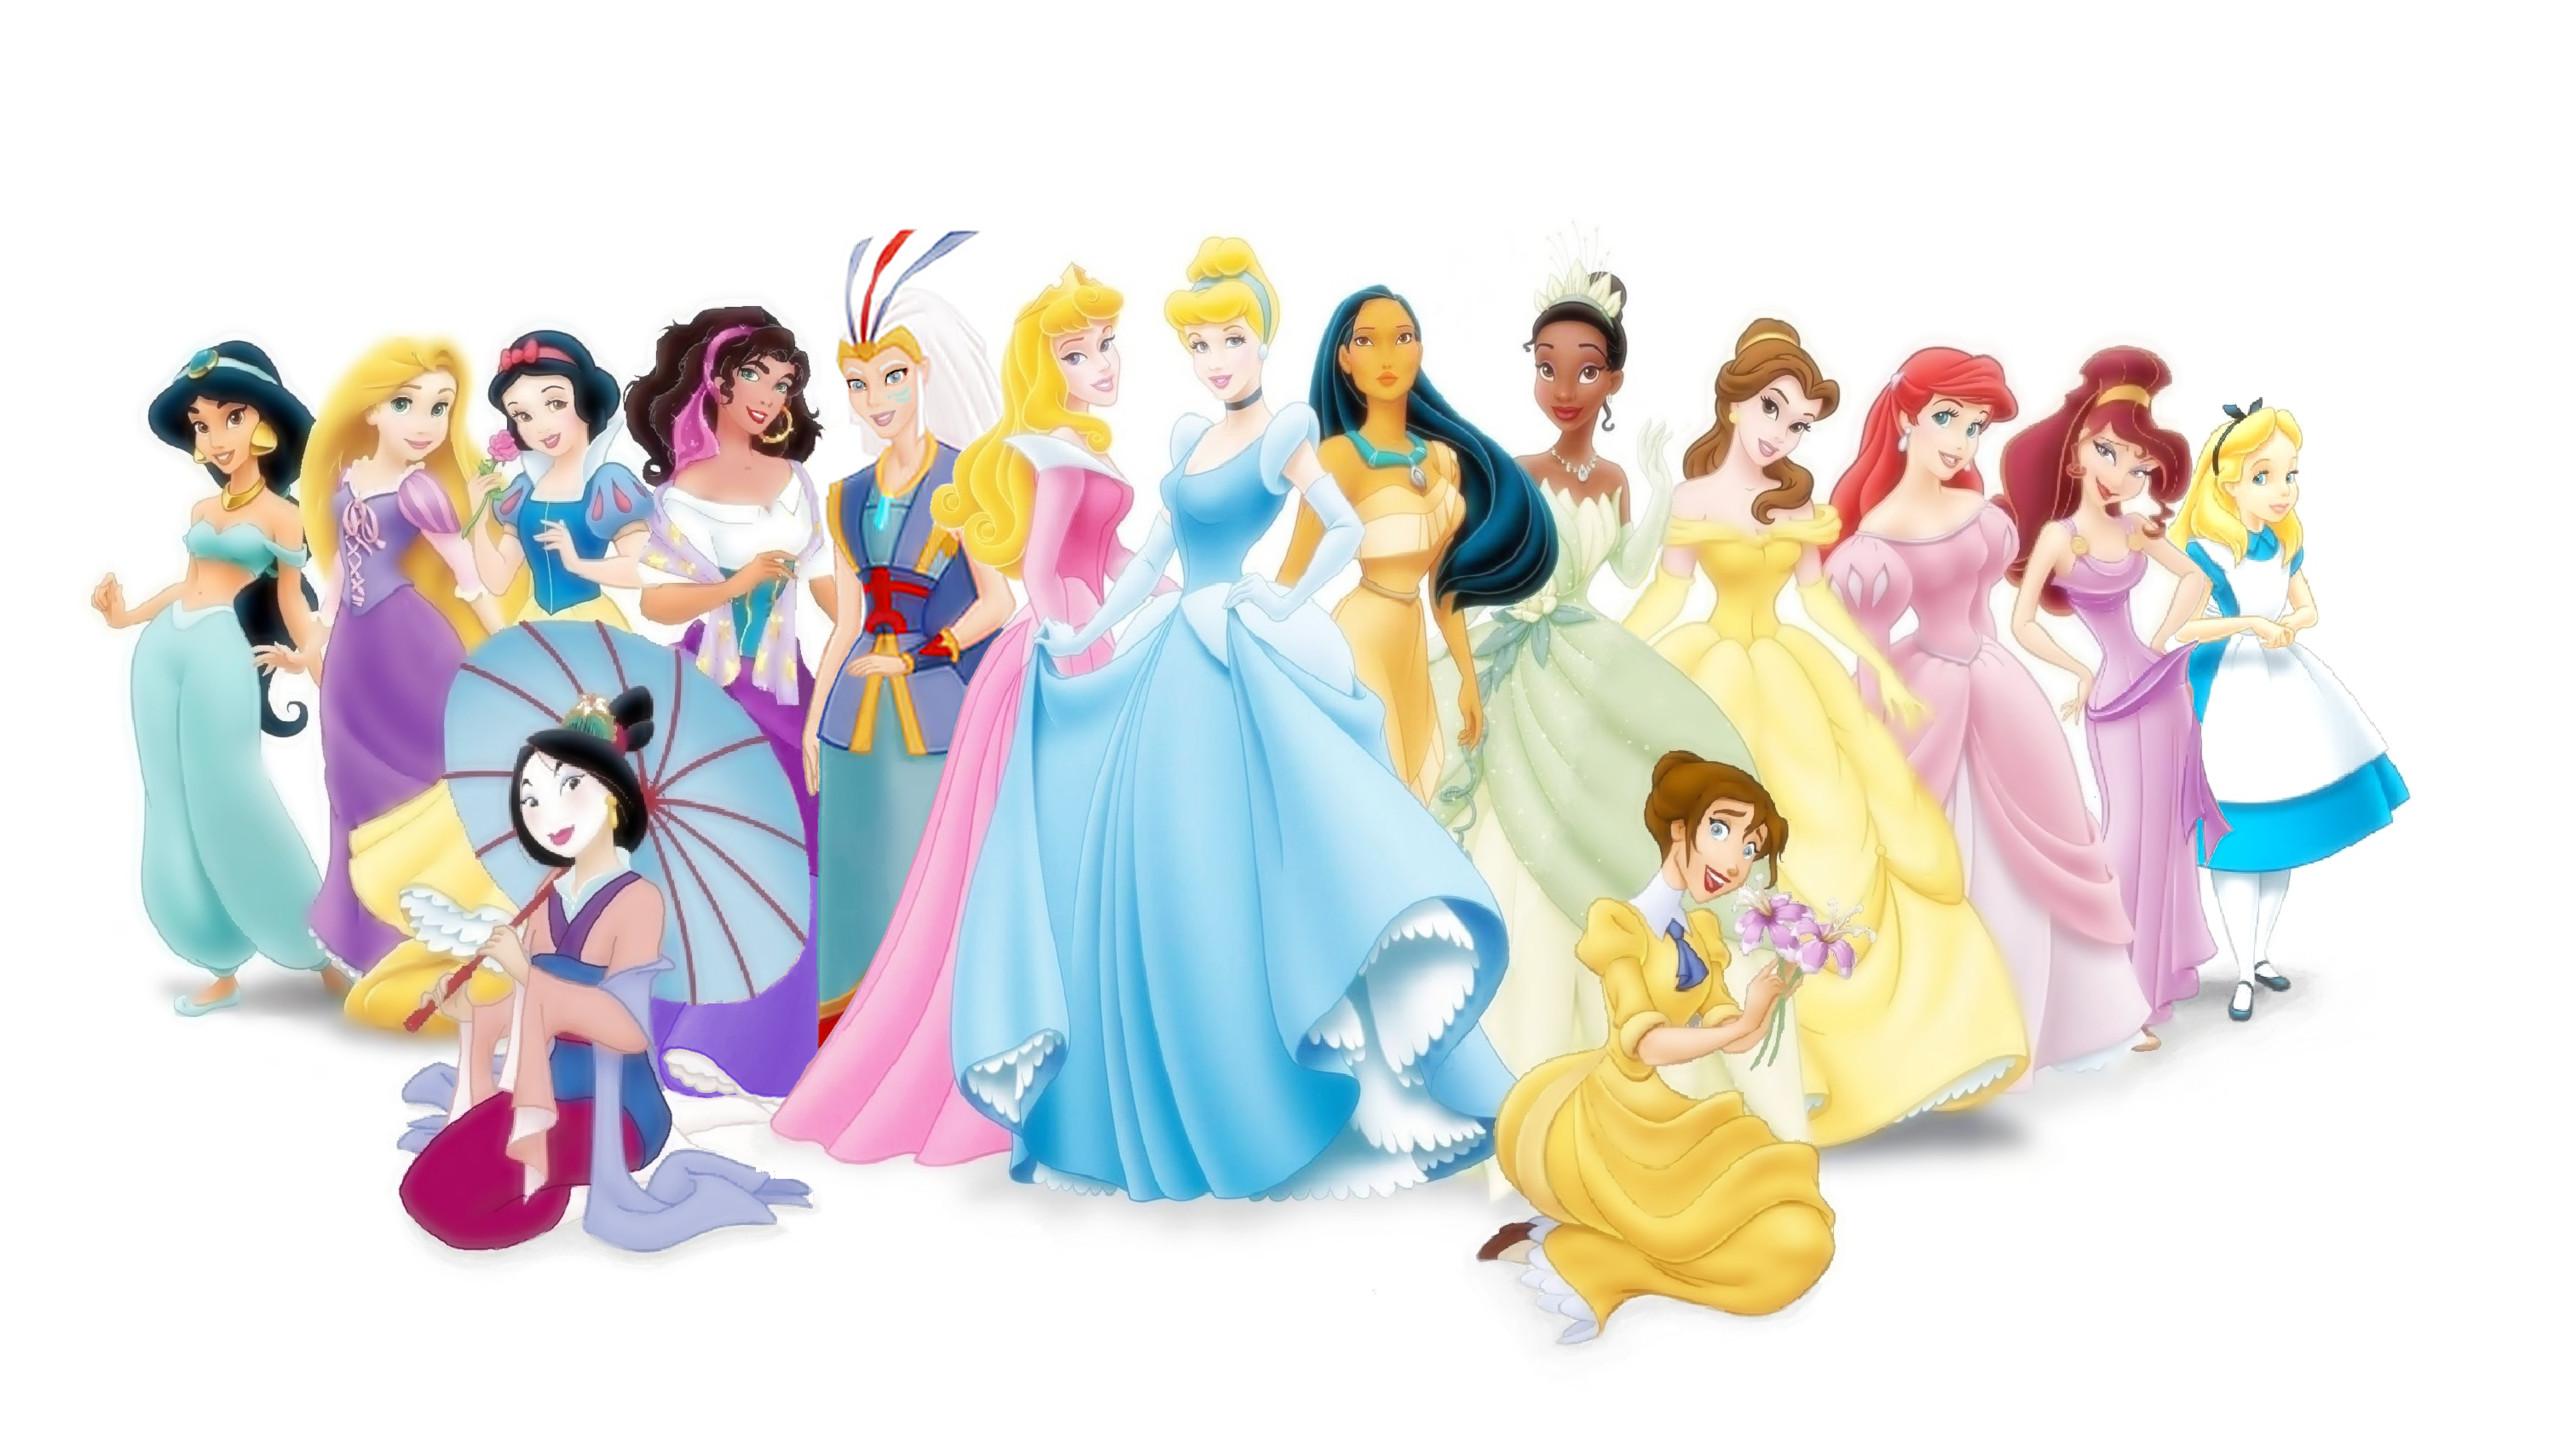 Disney princess wallpapers 66 images 1920x1200 princesas disney imagenes hd altavistaventures Choice Image